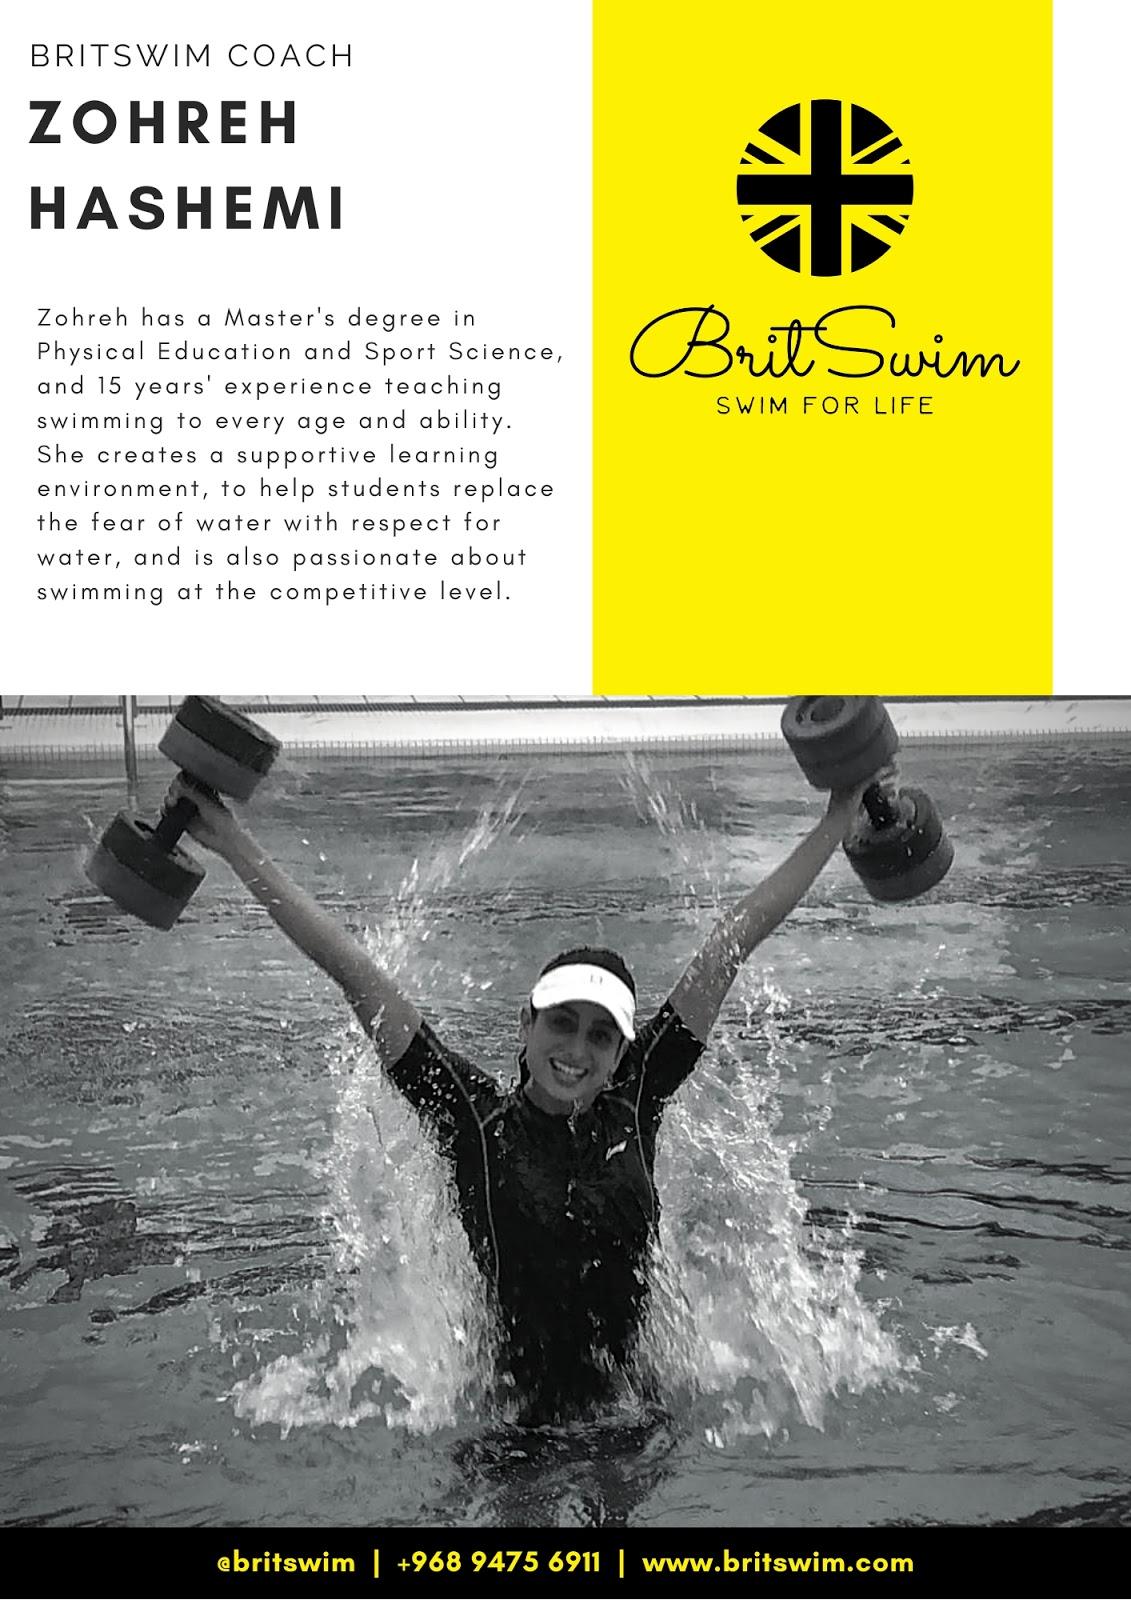 BritSwim learn to swim Muscat Oman swimming lessons teachers